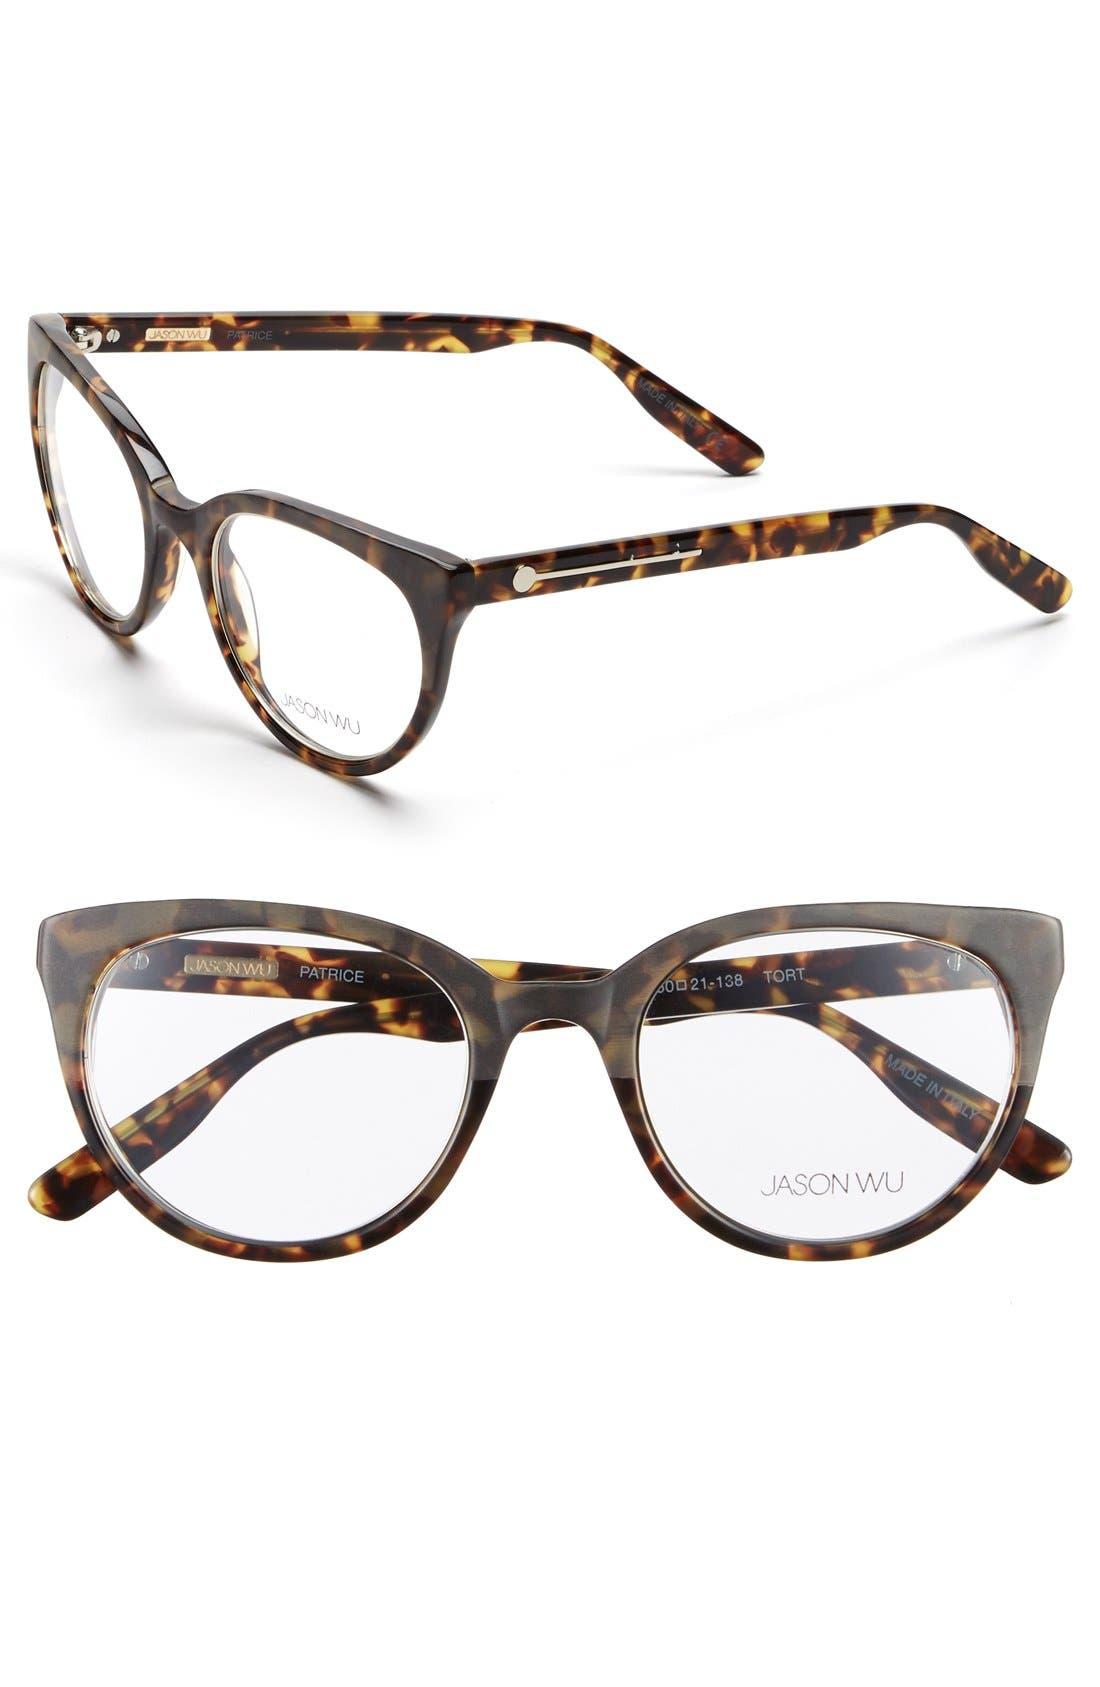 Main Image - Jason Wu 'Patrice' 50mm Optical Glasses